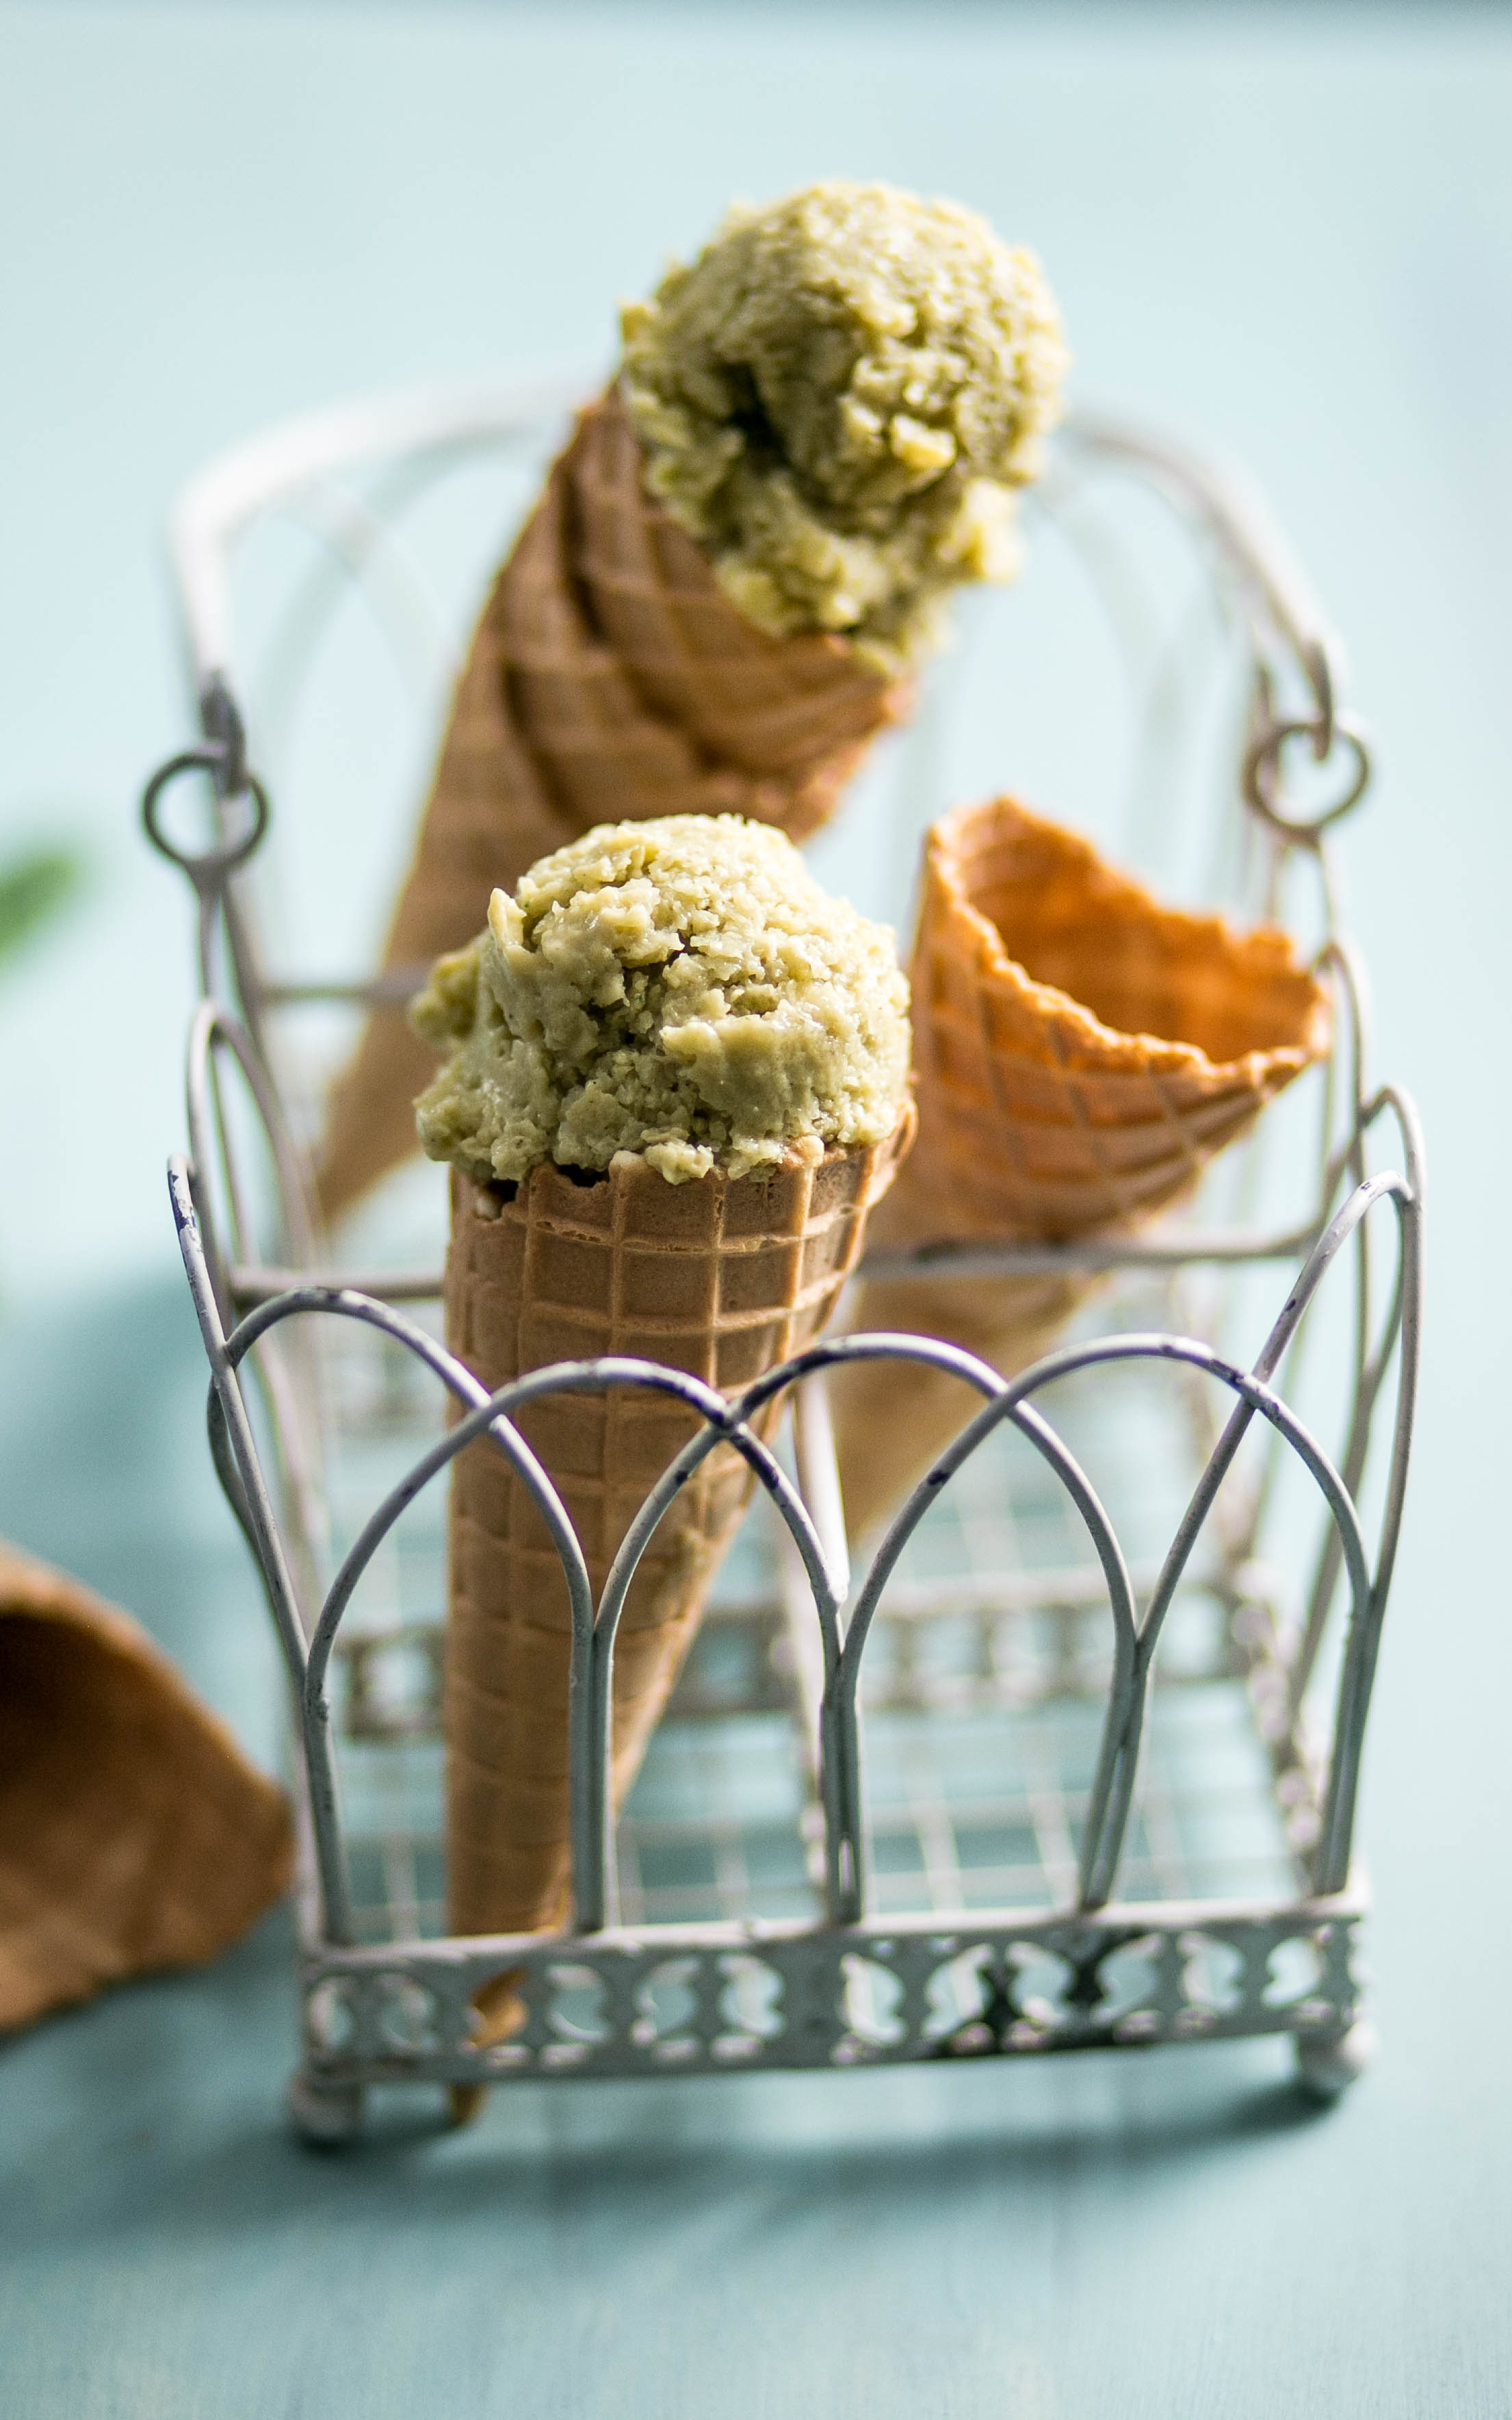 Apfel - Avocado - Eiscreme mit Minze